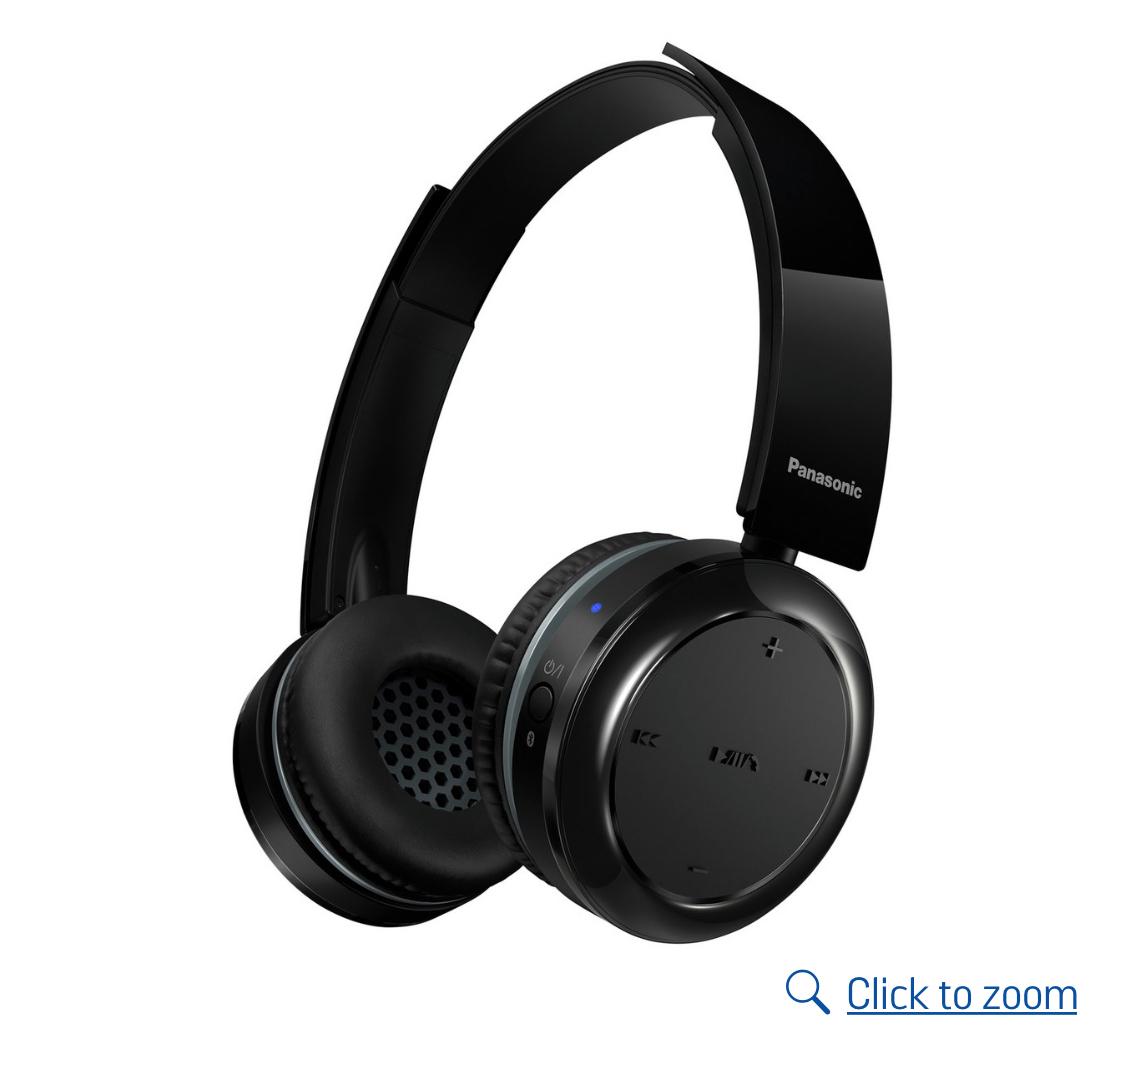 Panasonic RPBTD5EK Wireless On-Ear Headphones - Black £33.99 Argos